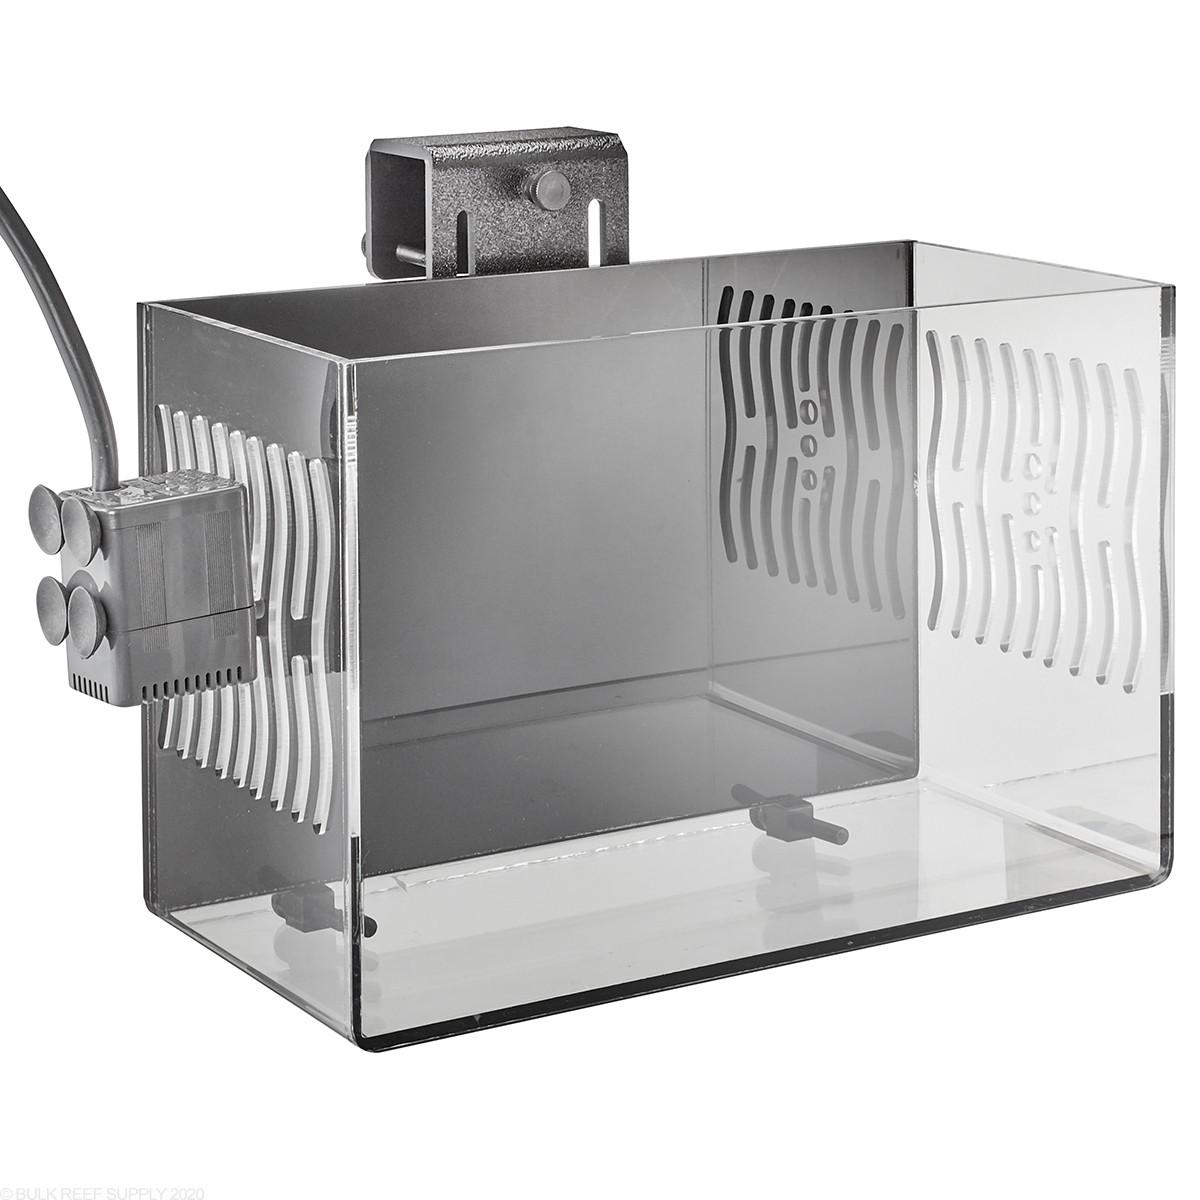 CITR 3 CPR Aquatic Small Pro in Tank Refugium